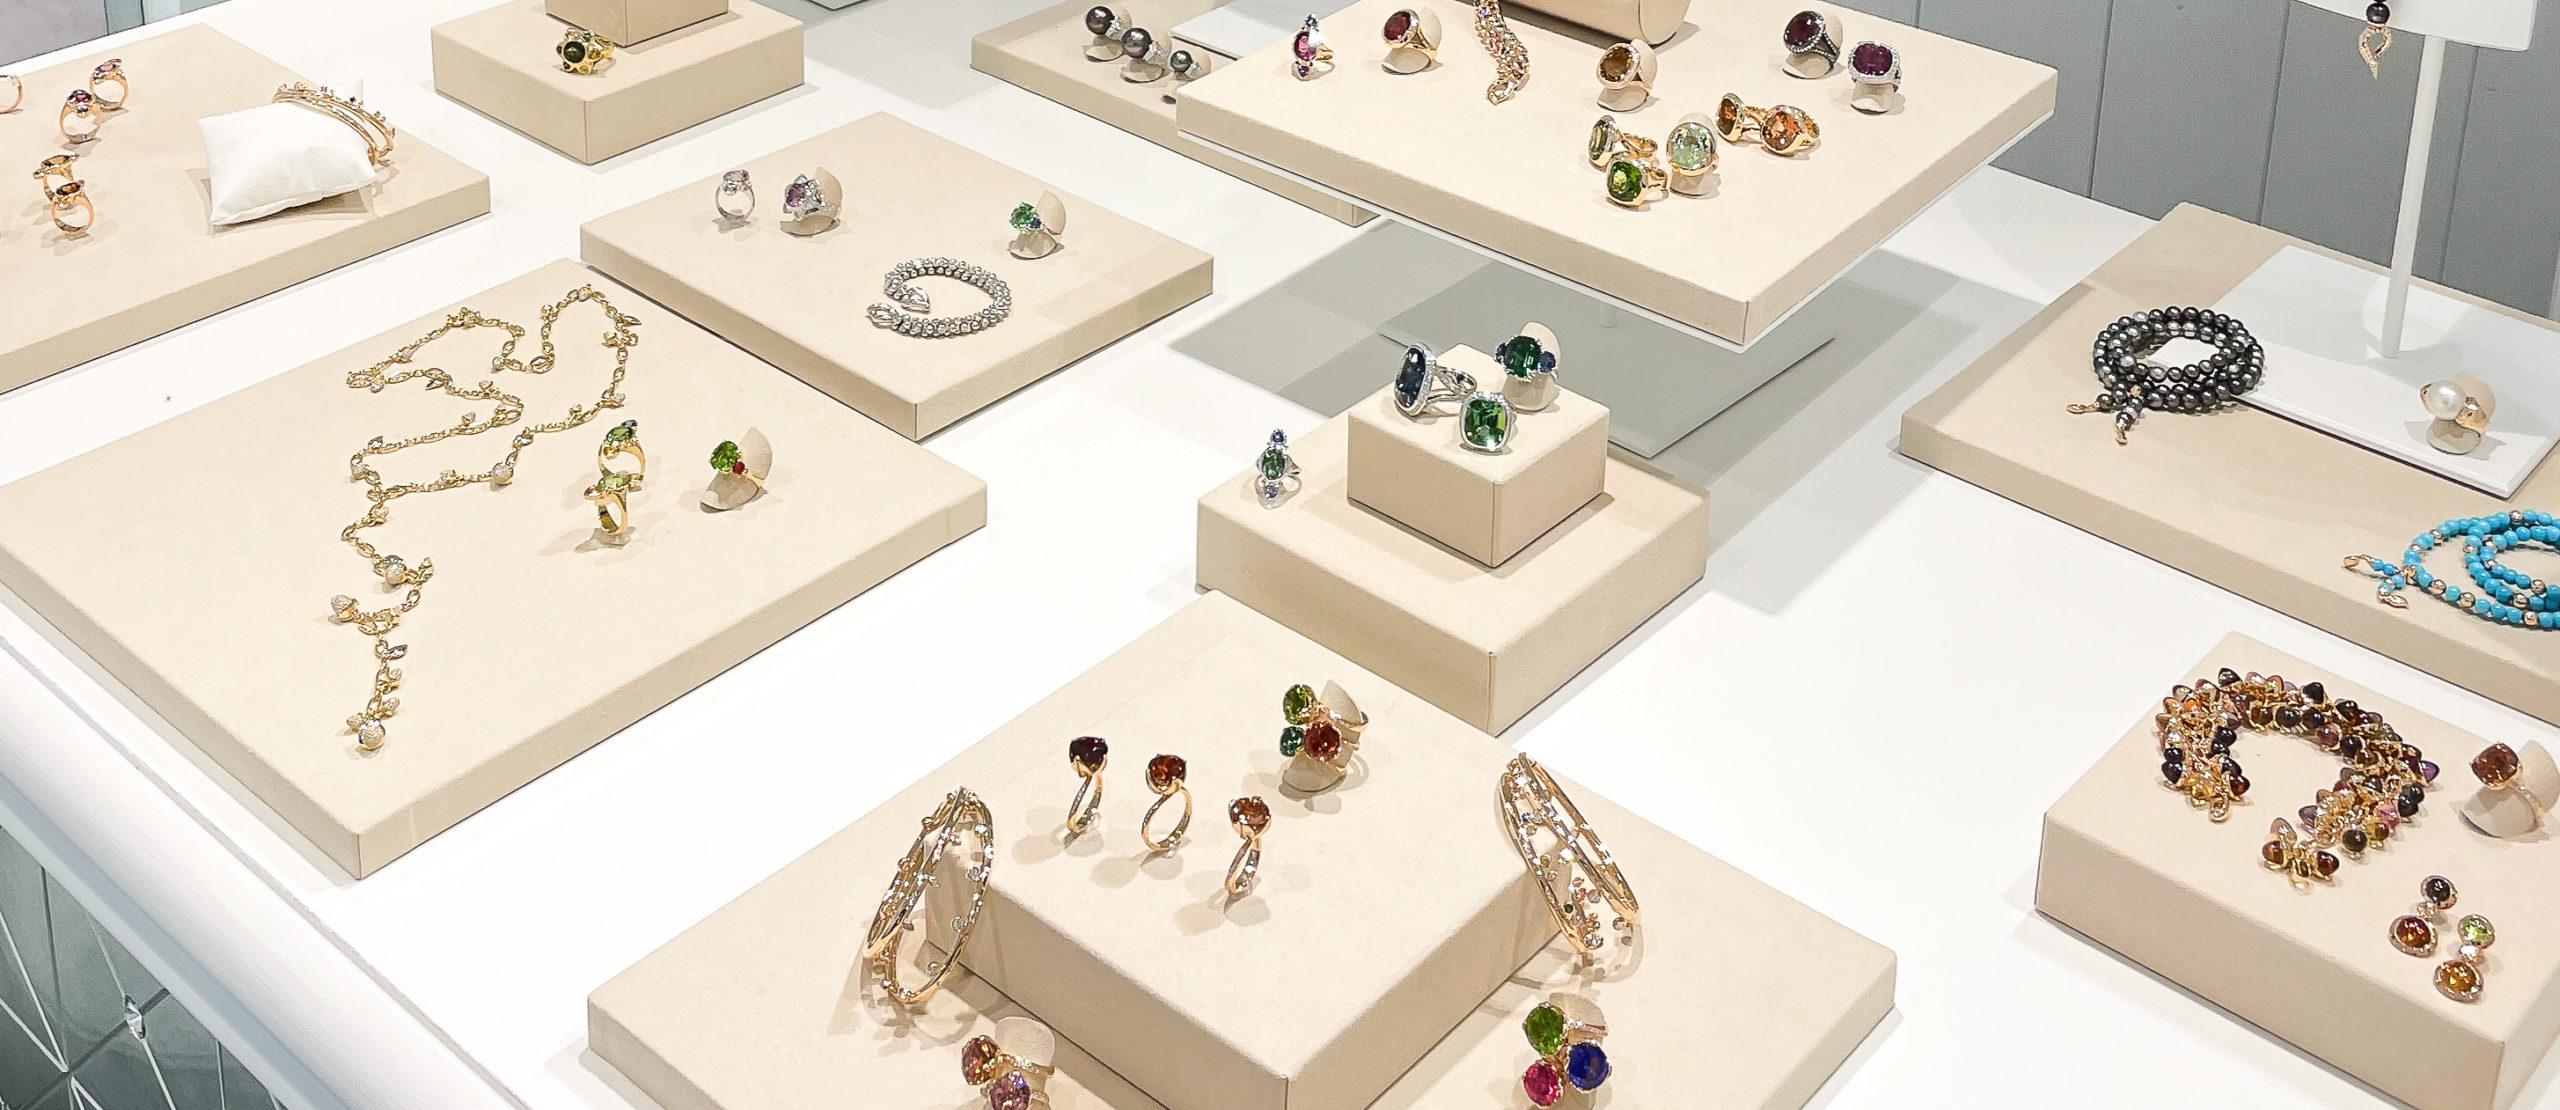 Schmuck, Nürnberg, Galerie Voigt, Ringe, Armbänder, Tamara Comolli, Kette,